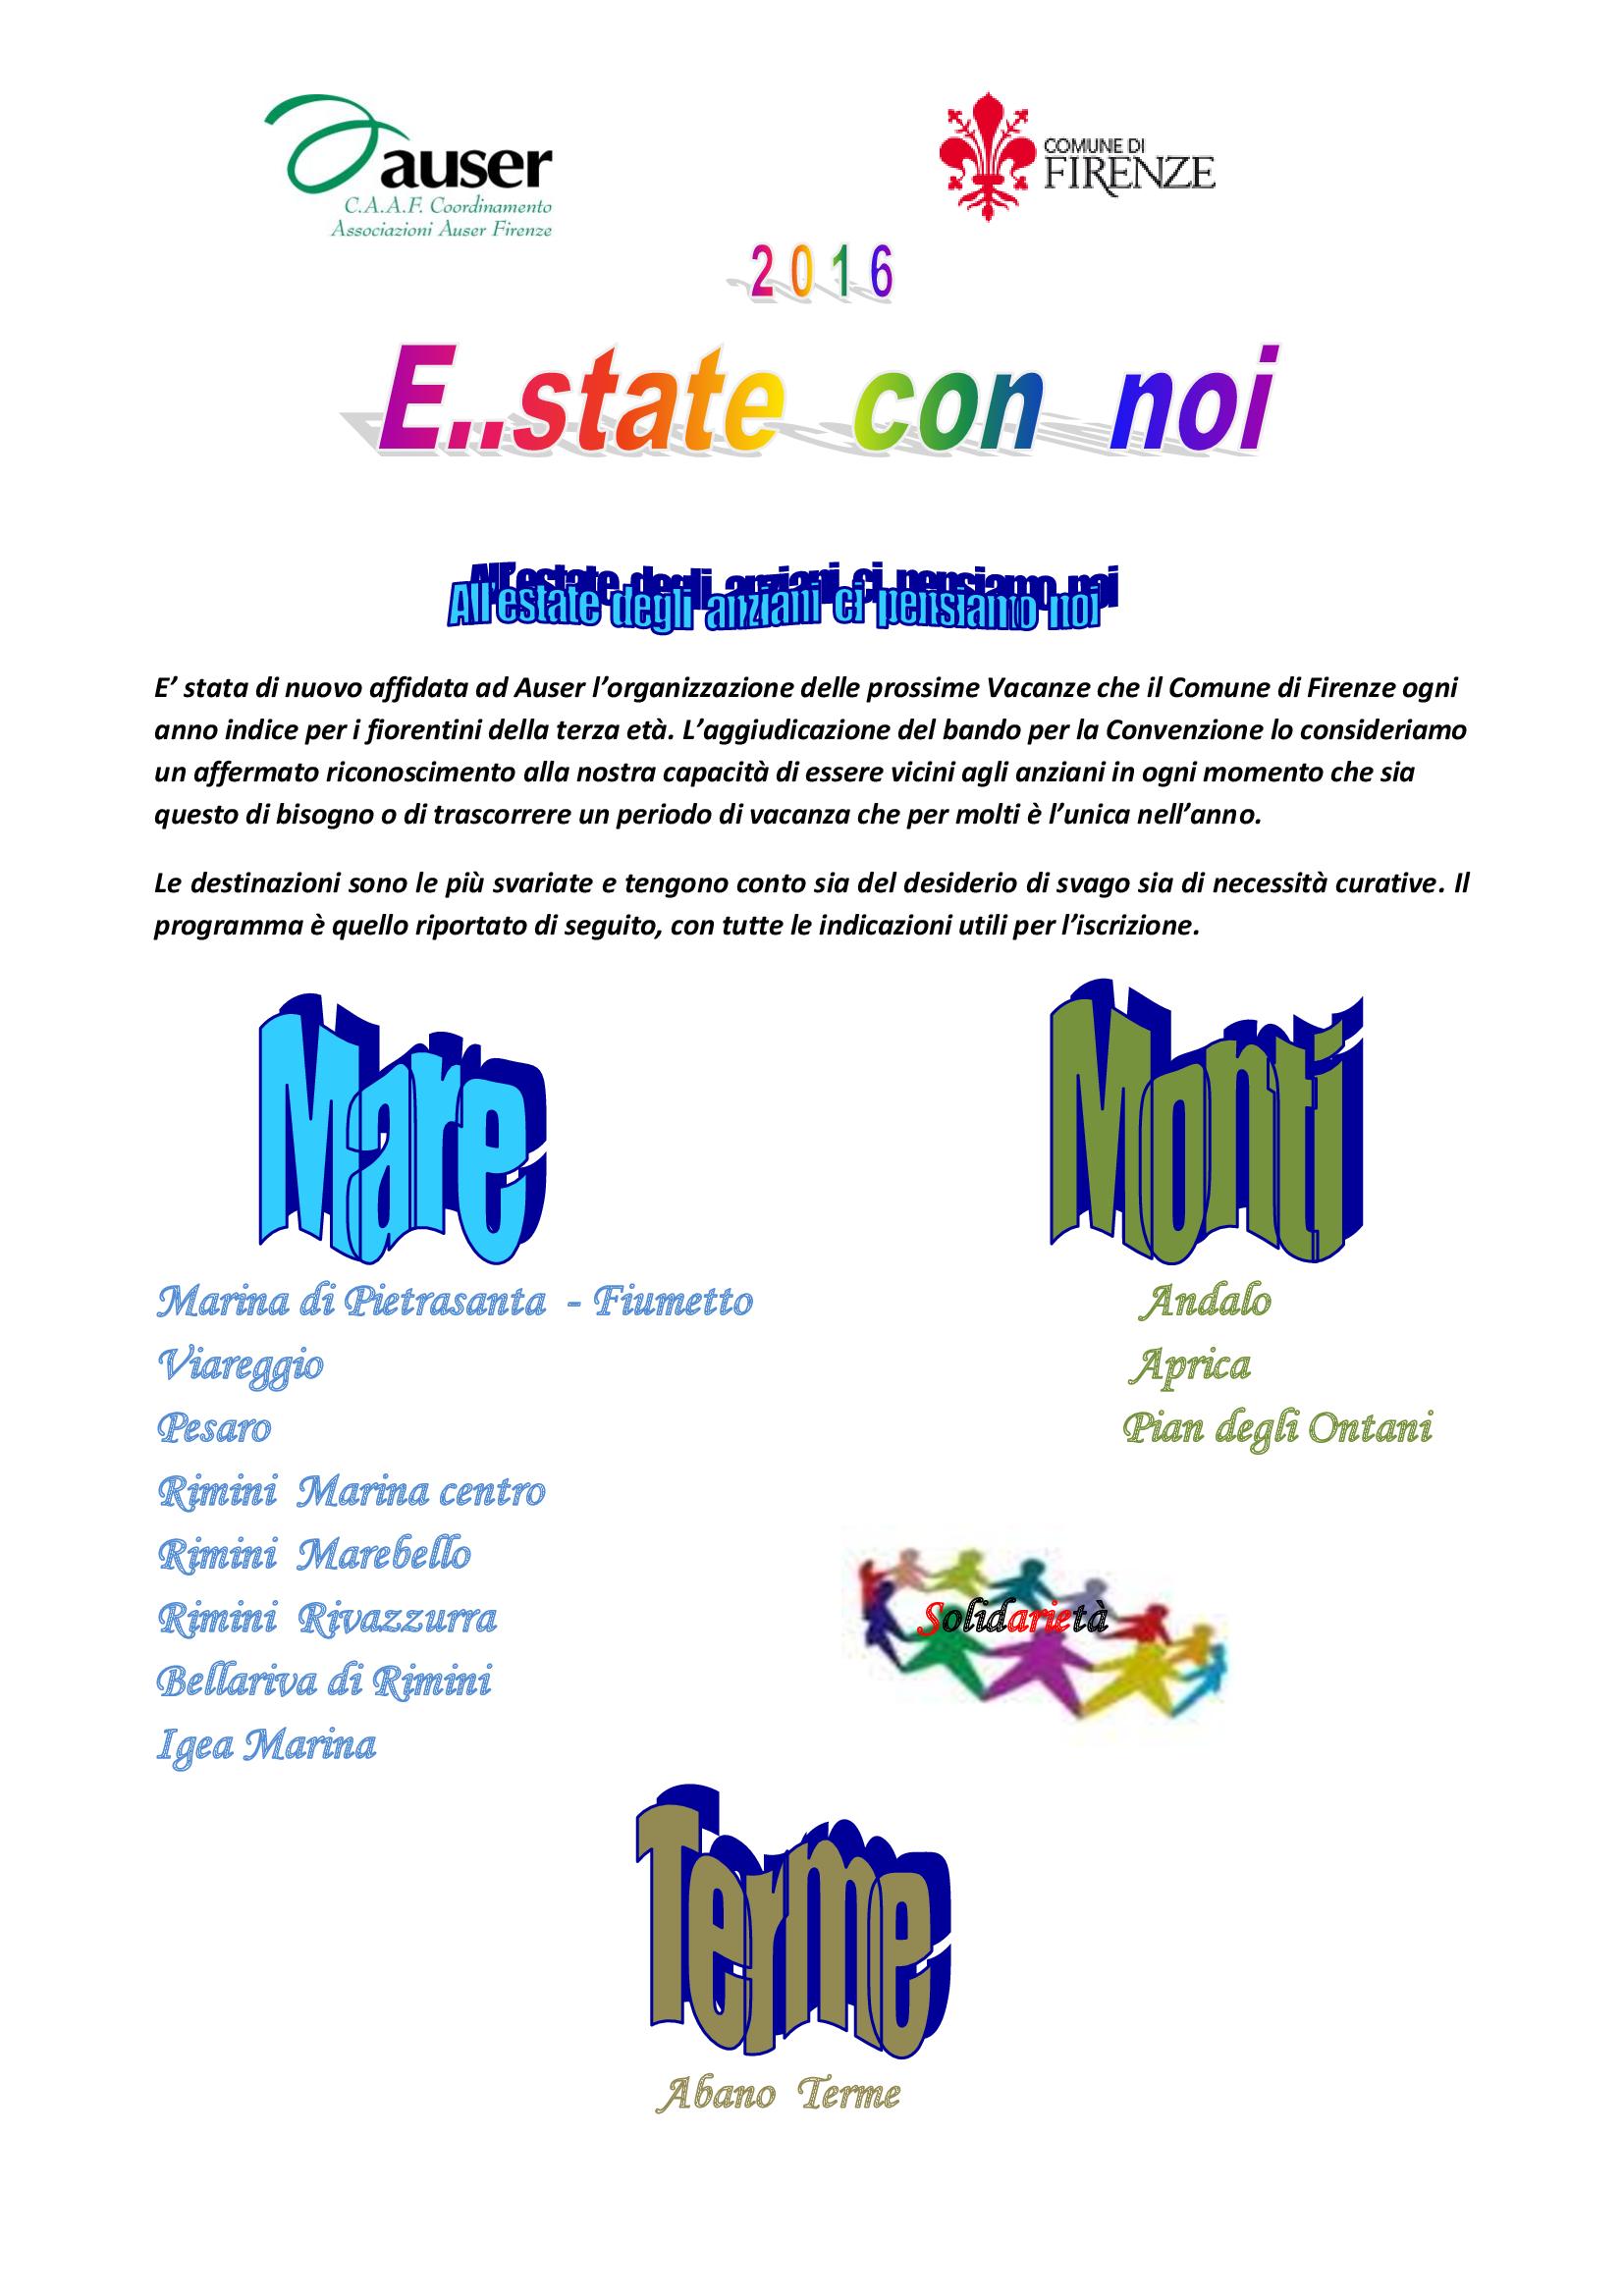 vacanze-anziani-2016-locandina-auser